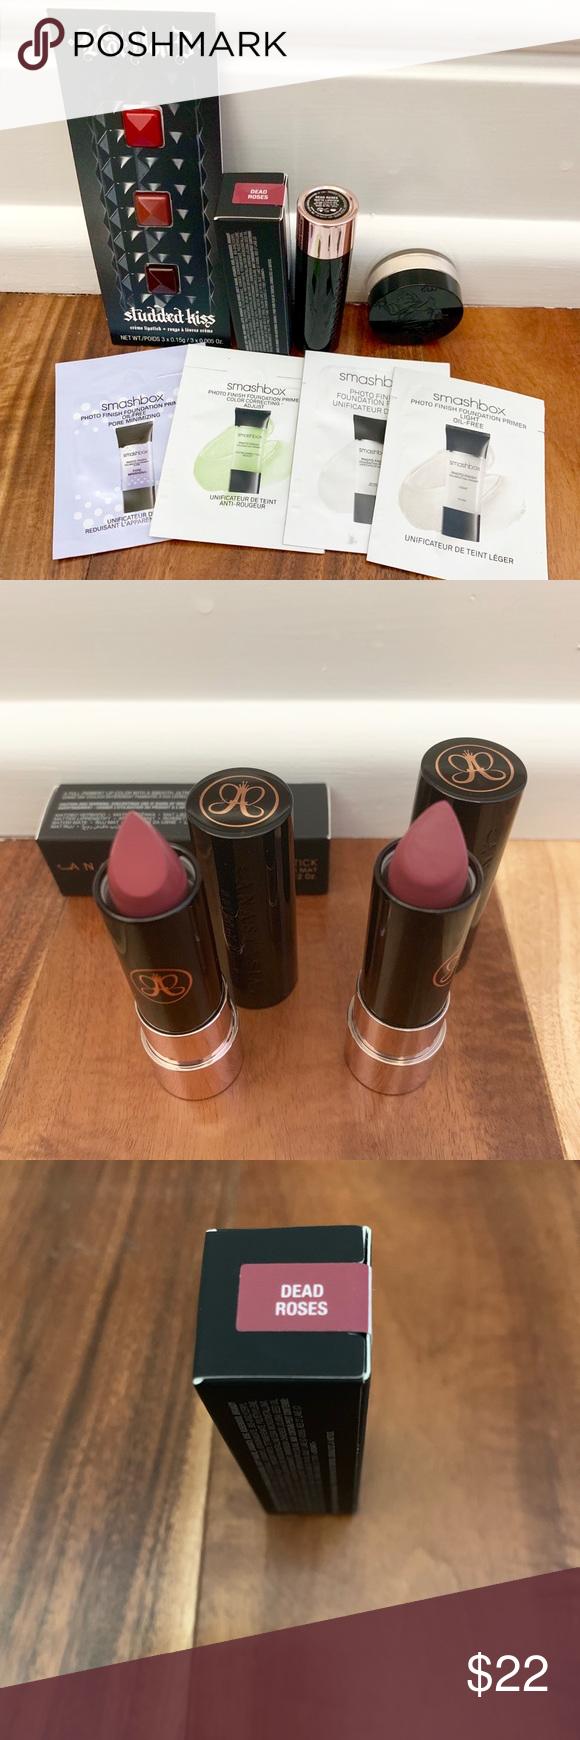 Anastasia lipsticks Selling 2 Anastasia lipsticks in the color Dead Roses. 1 is ...